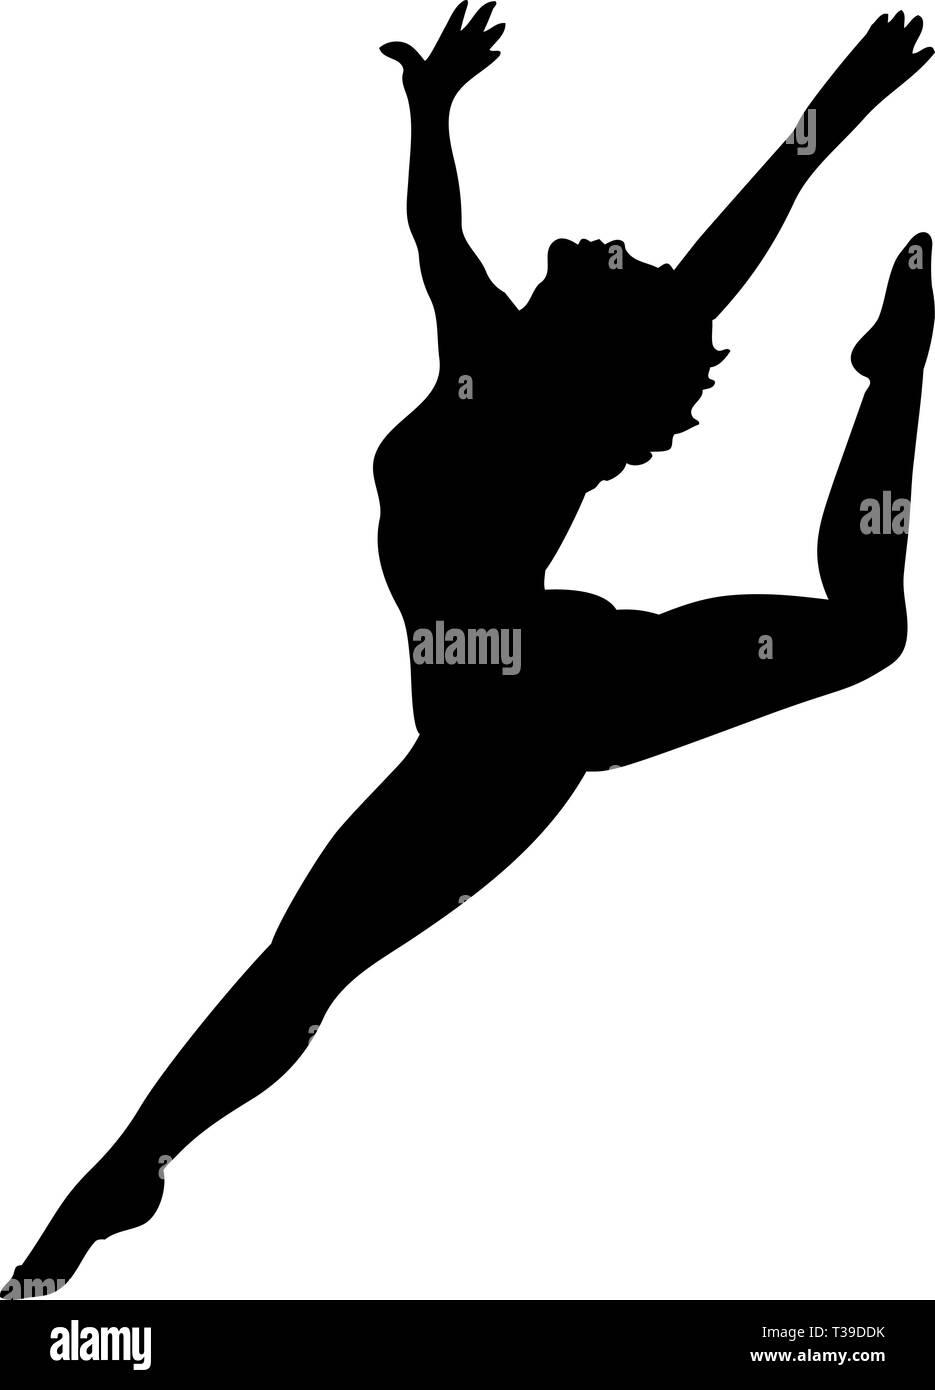 Dancer Silhouette Vector Illustration Stock Vector Image Art Alamy